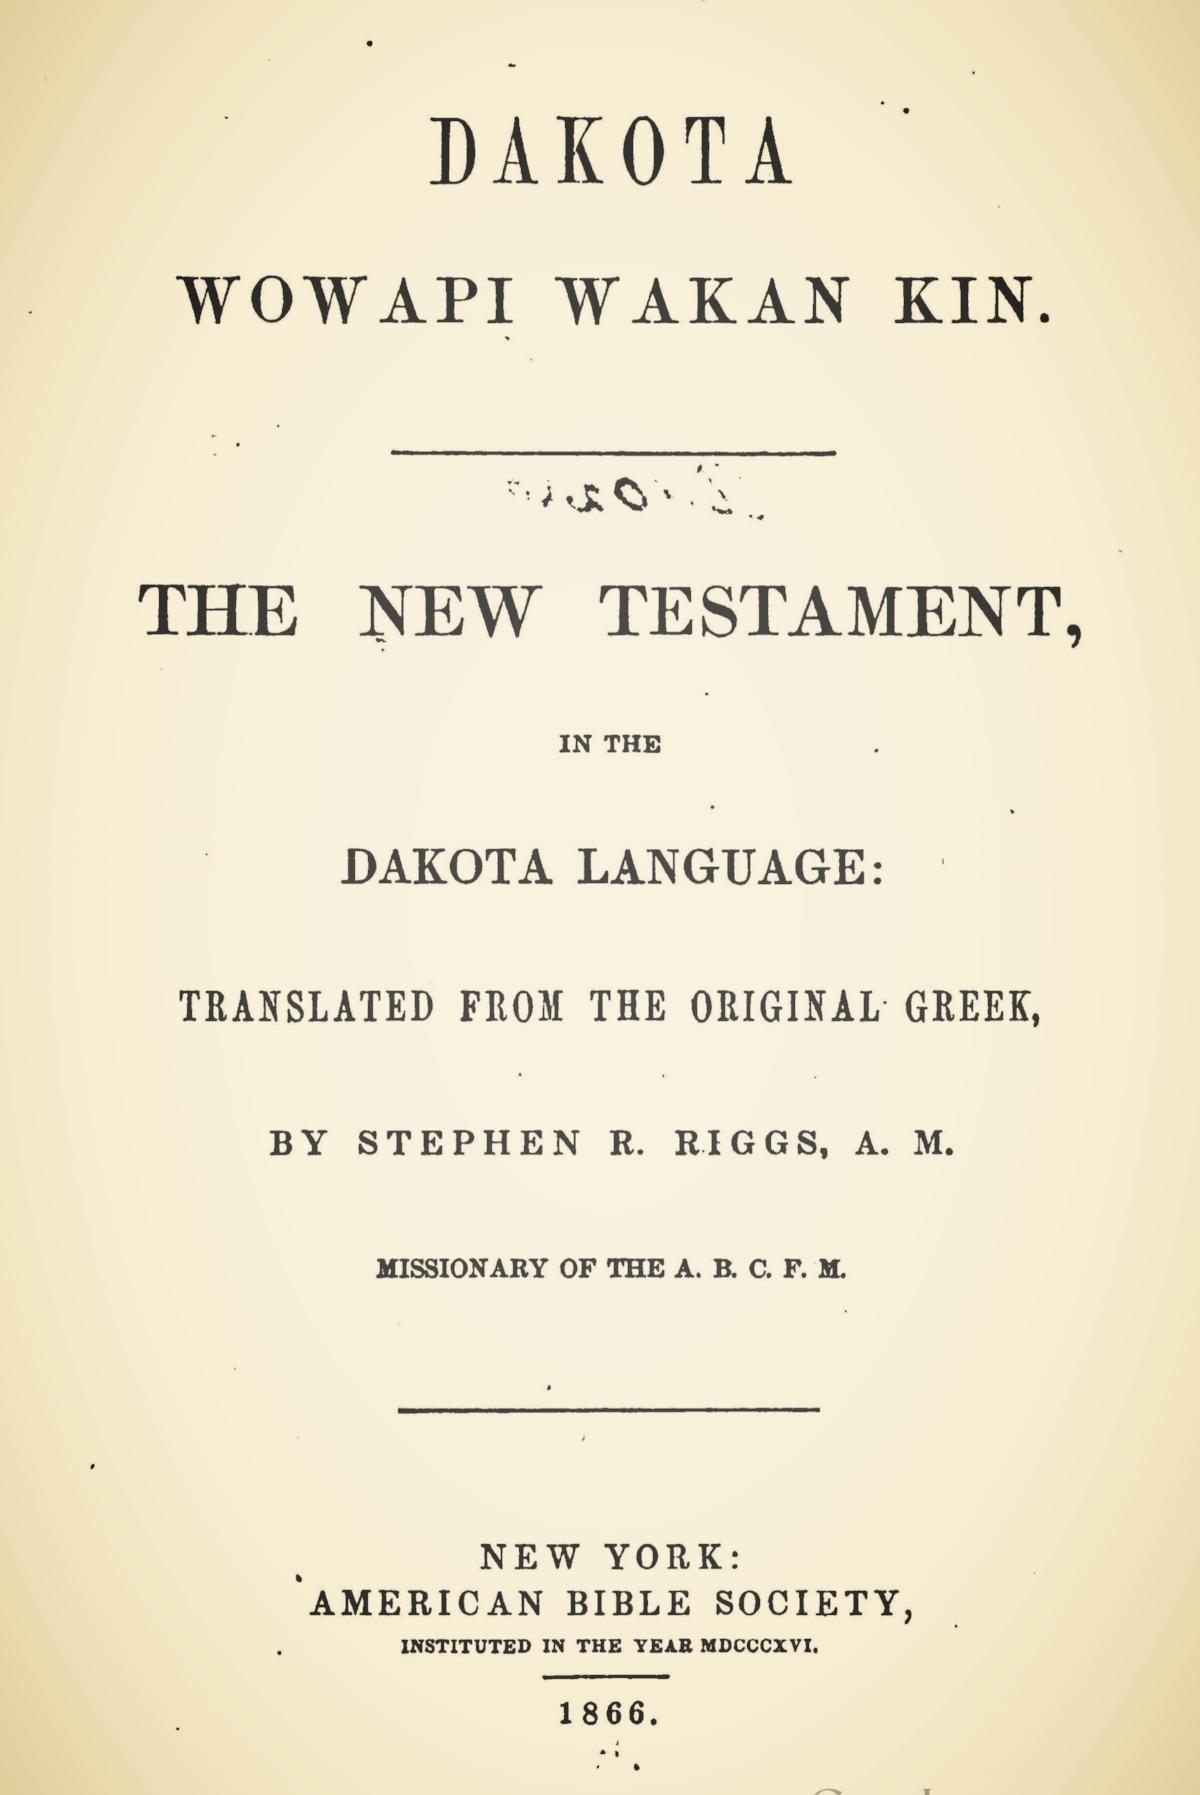 Riggs, Stephen Return, Dakota Wowapi Wakan Kin The New Testament, in the Dakota Language Title Page.jpg